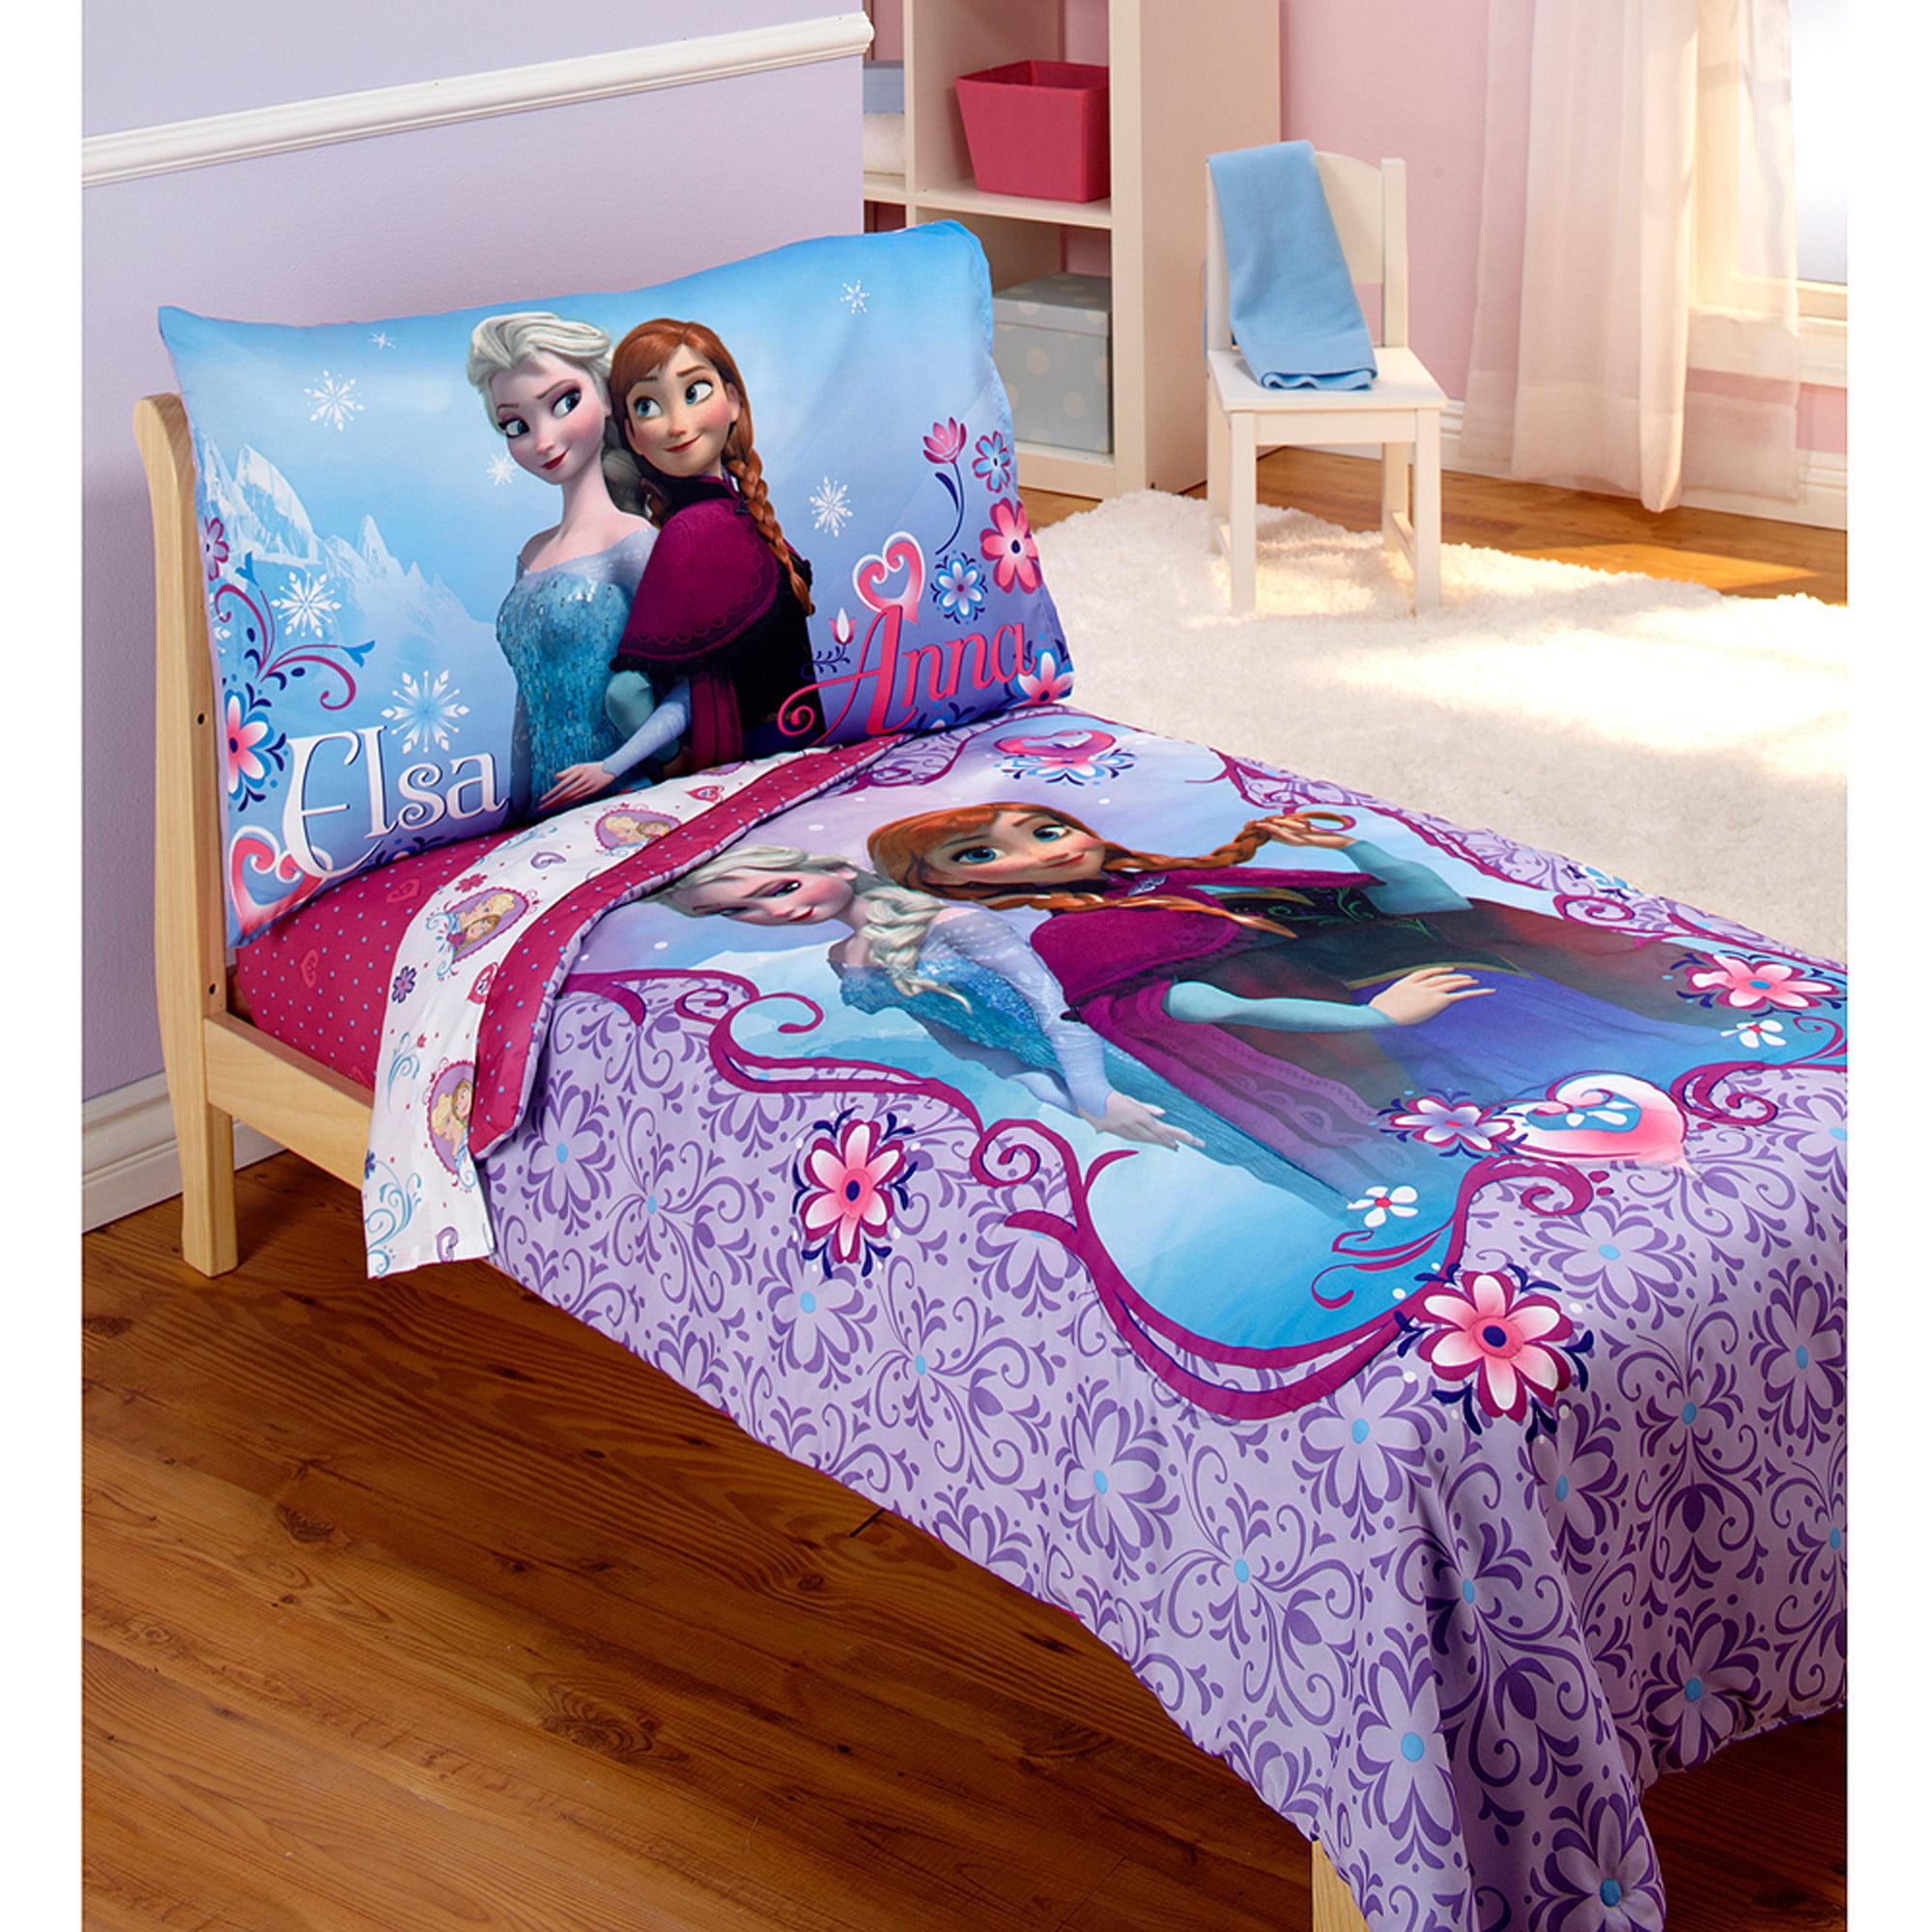 Disney Frozen Elsa & Anna 4pc Toddler Bedding Set